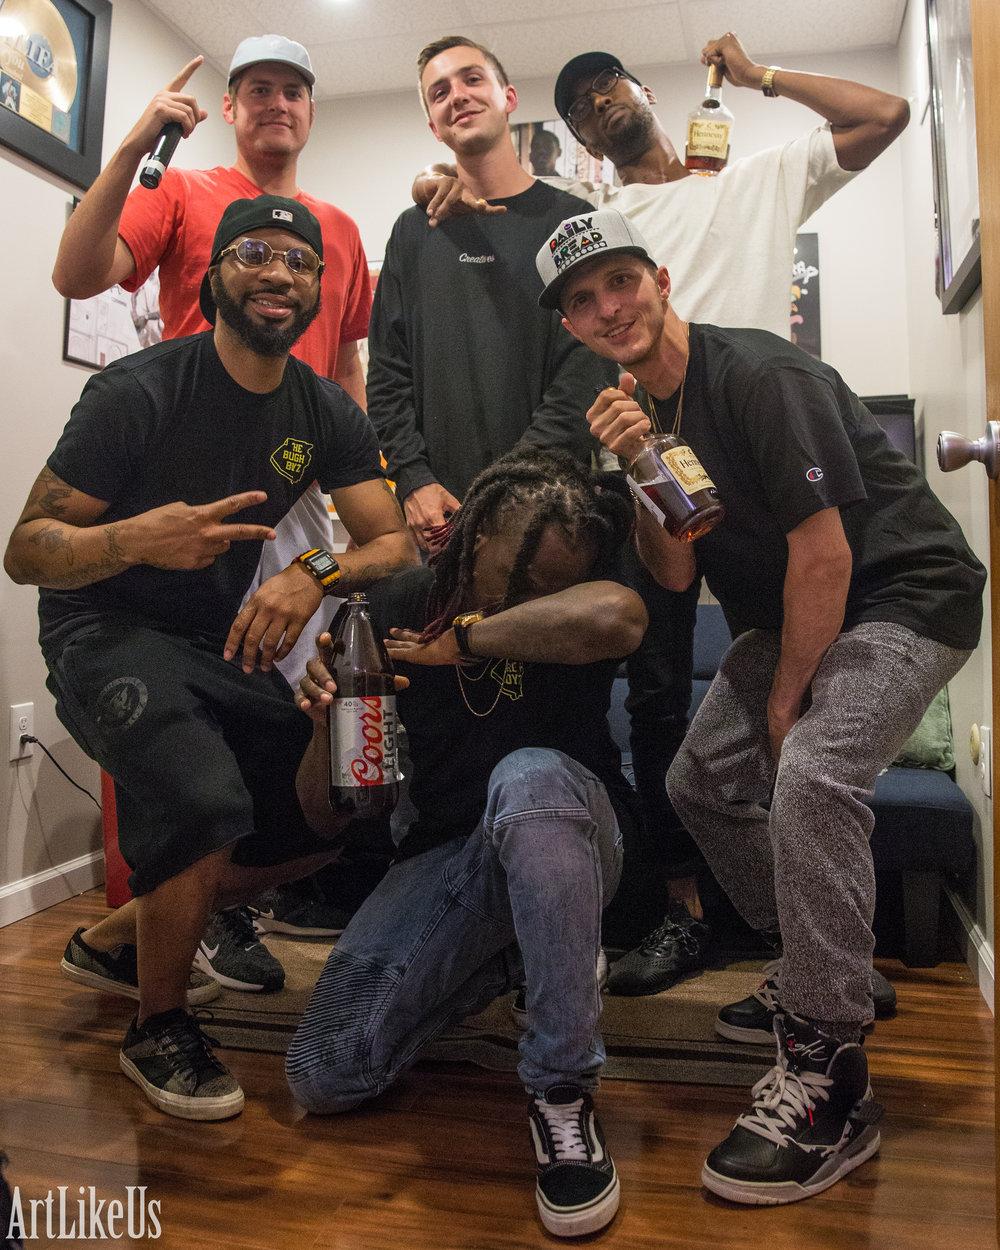 ArtLikeUs - Burgh Boyz Chance & Cody-26.jpg